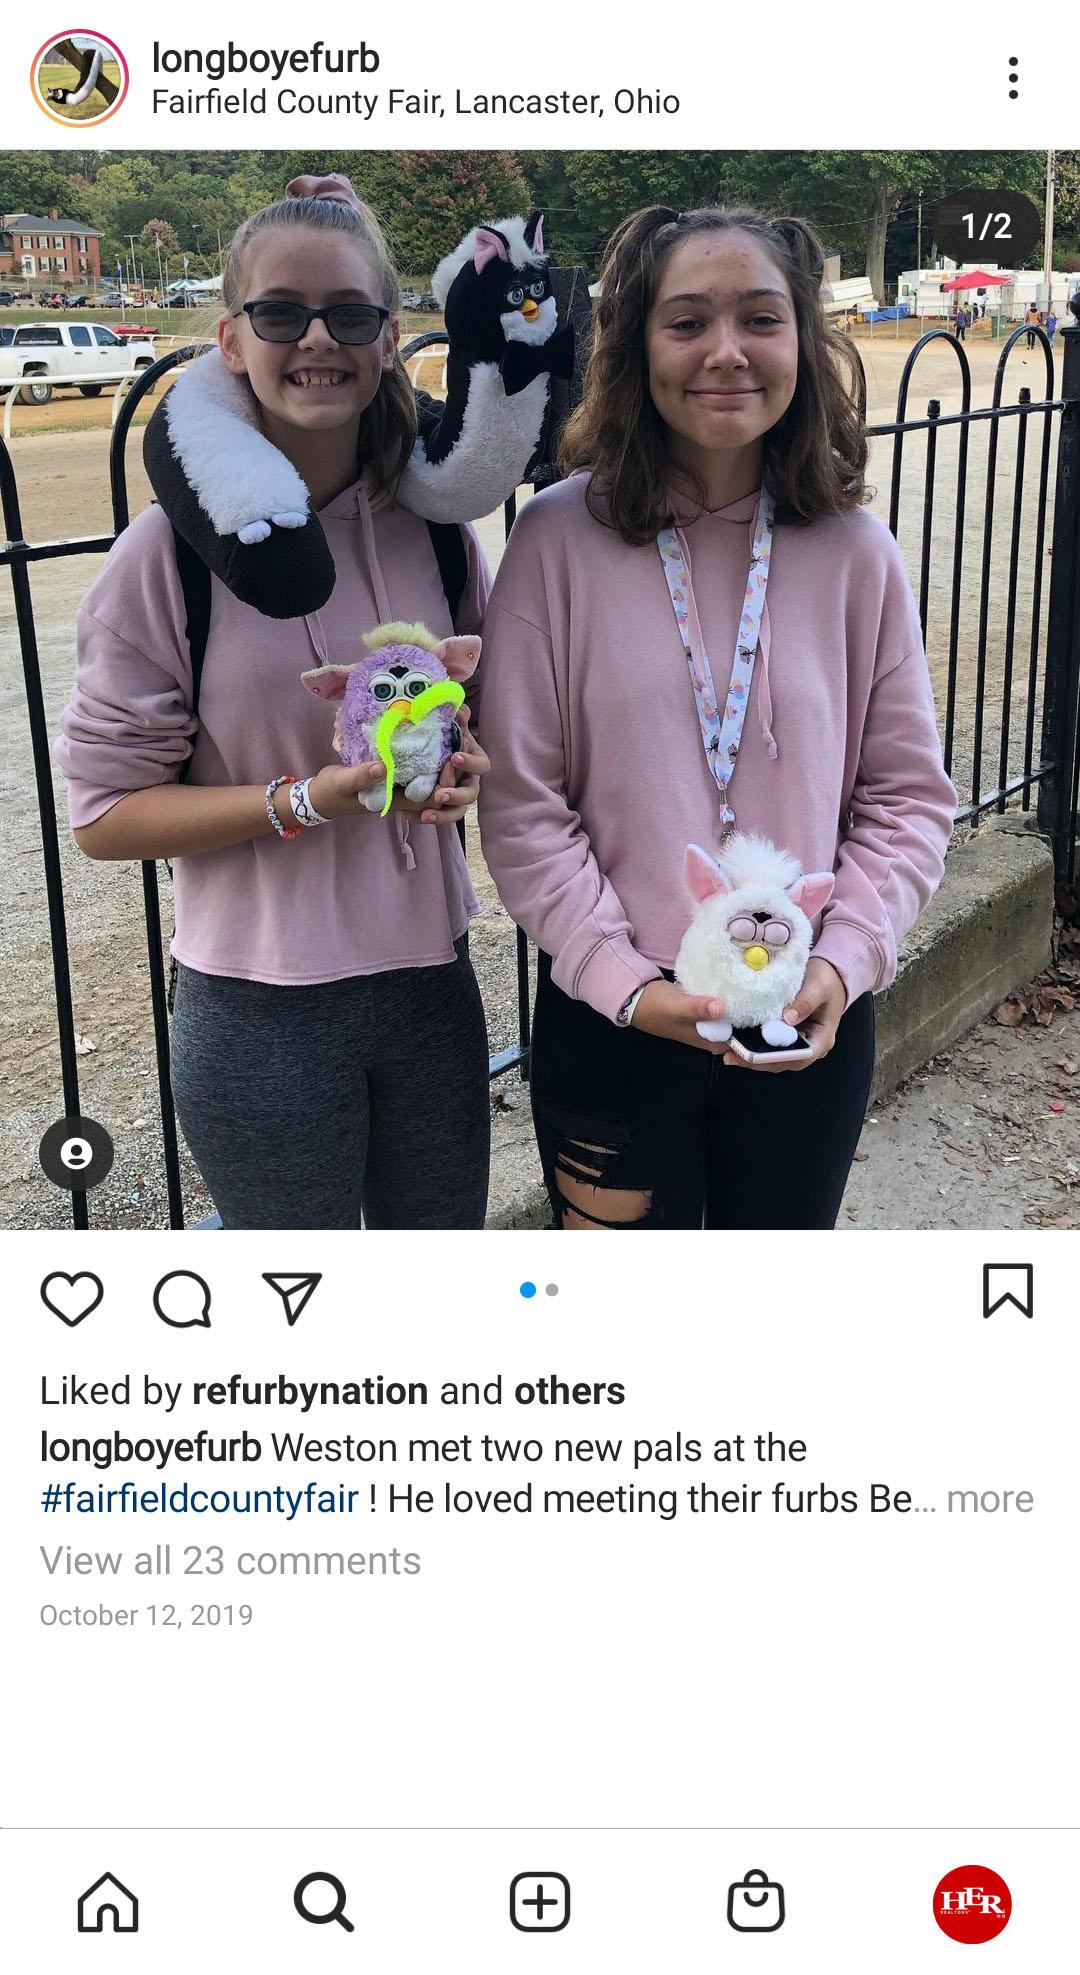 2 girls at Fairfield County Fair